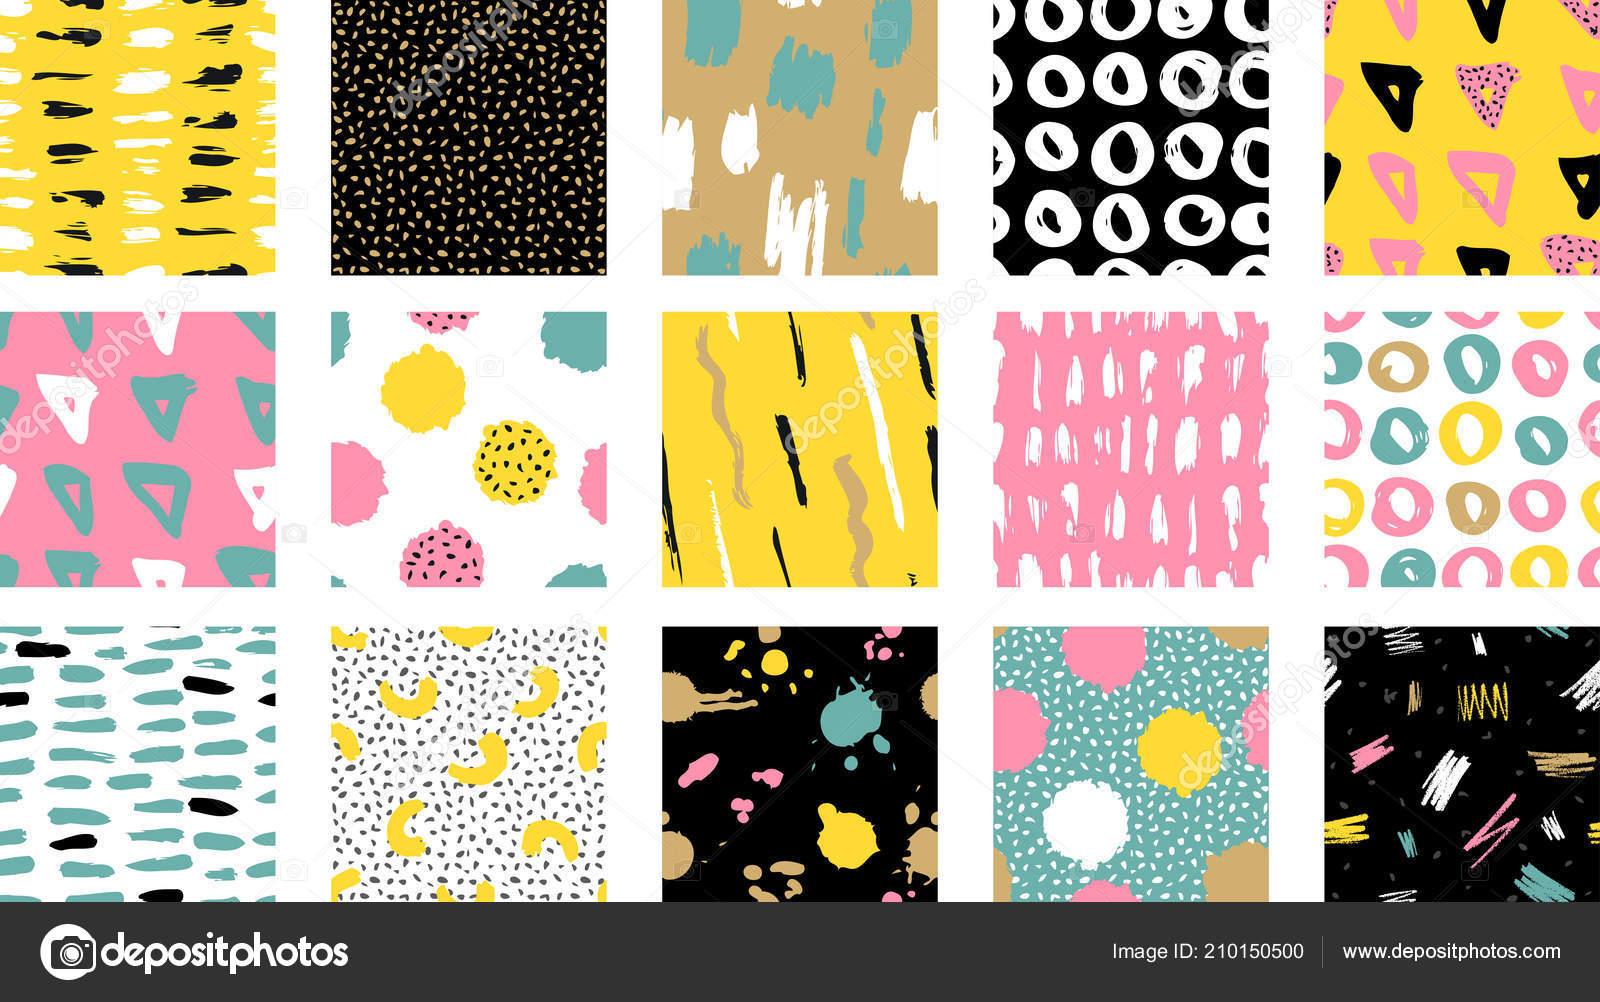 Trendy Vector Seamless Colorful Pattern Brush Strokes Design Backgrounds Wallpaper Stock Vector C Tolchik 210150500